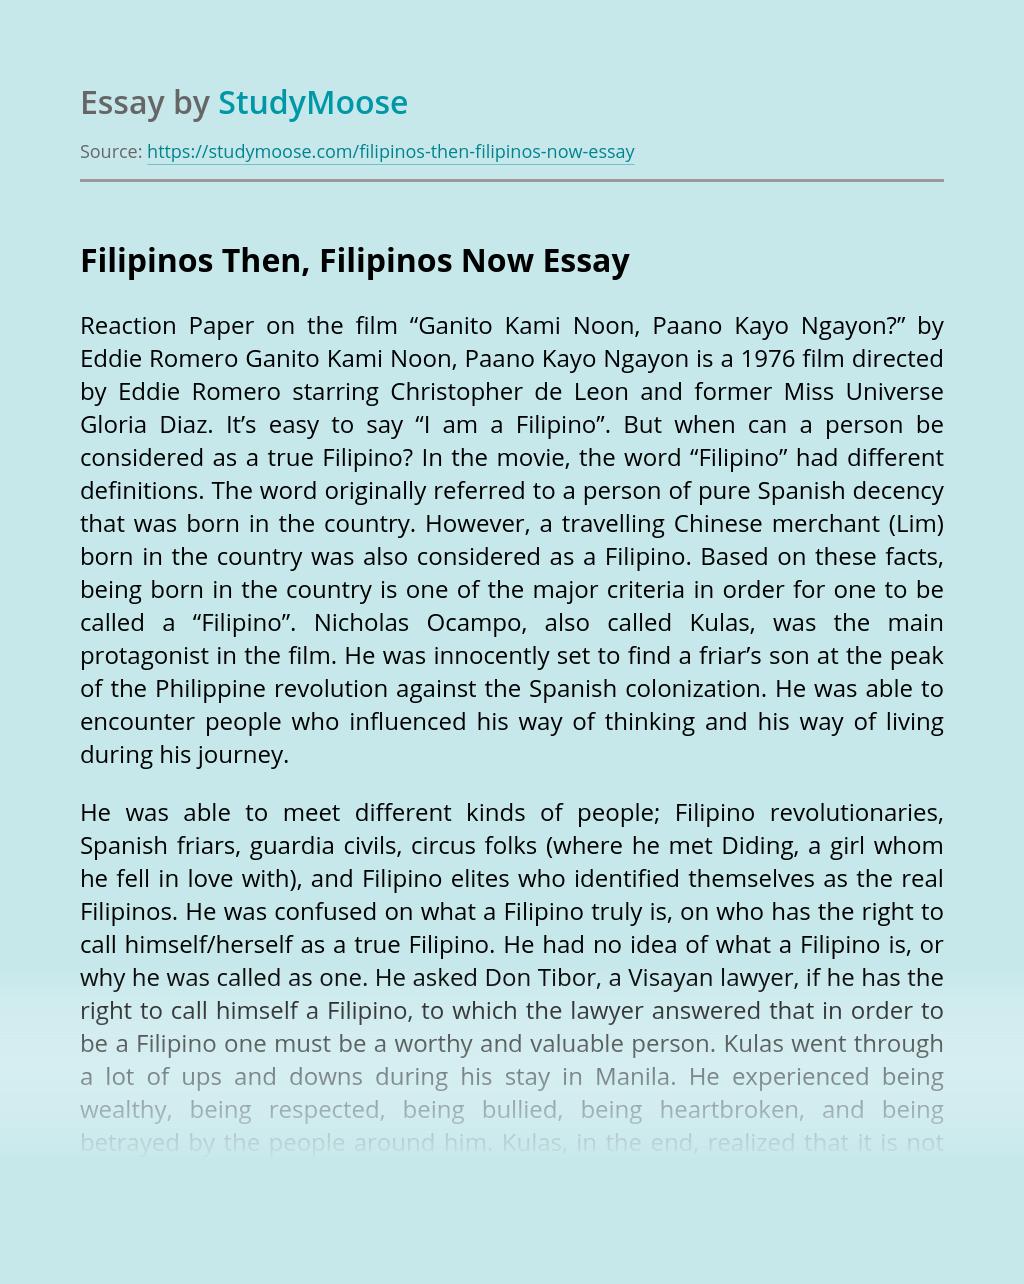 Filipinos Then, Filipinos Now